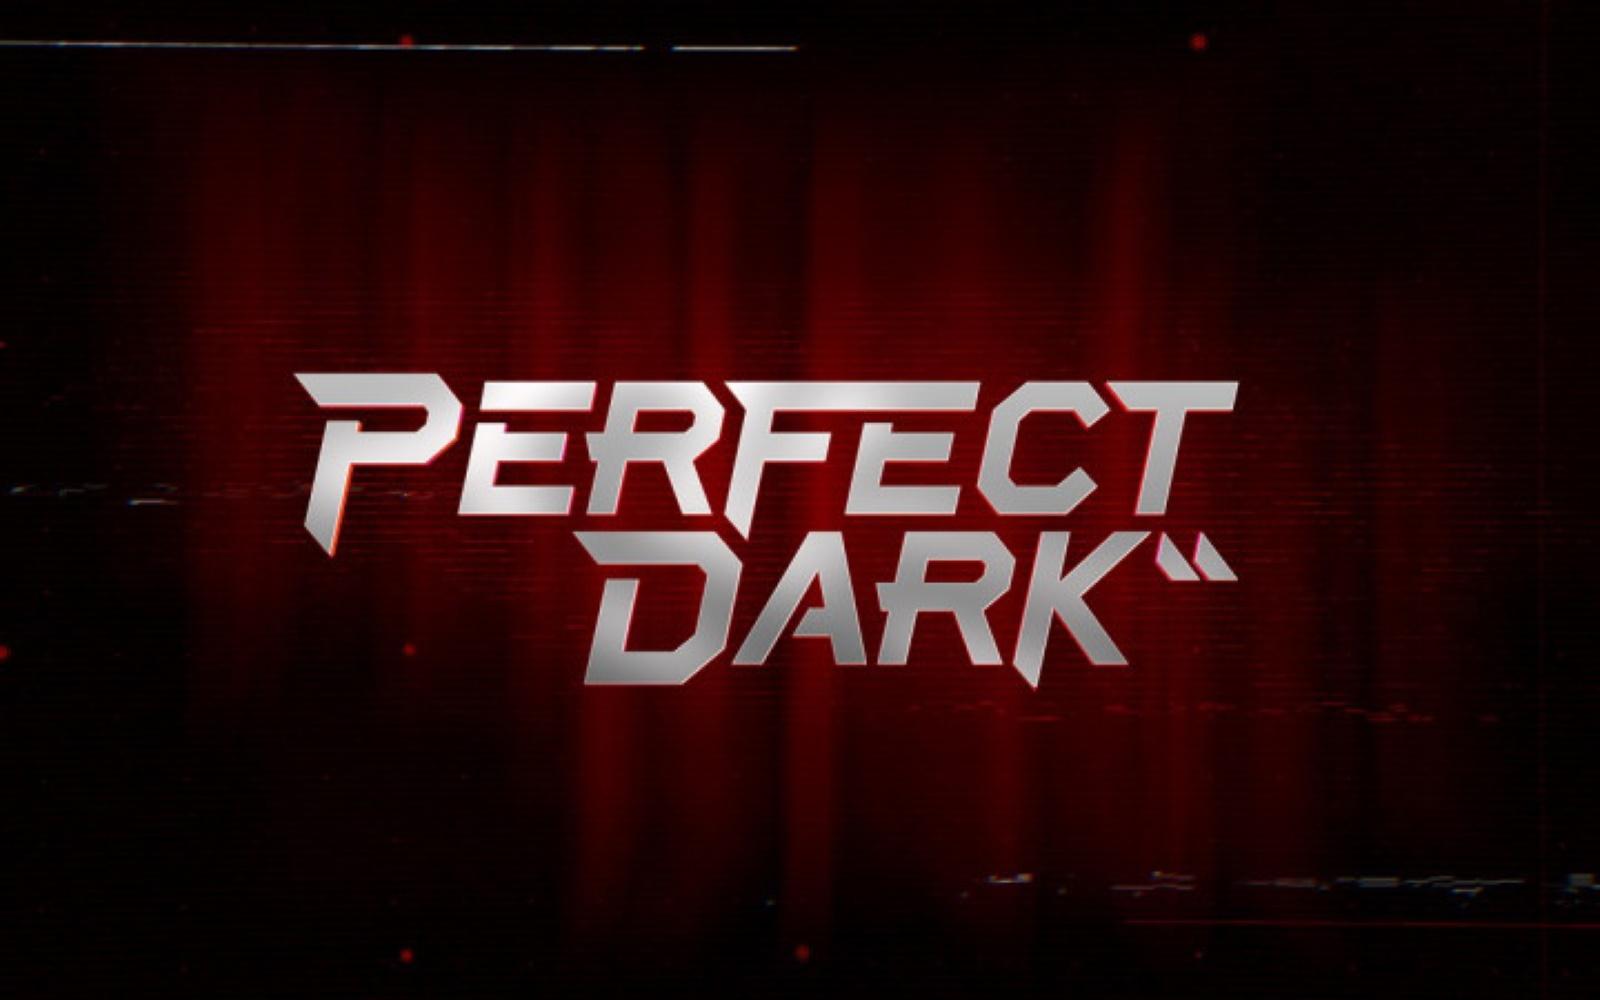 New Perfect Dark Game Announced